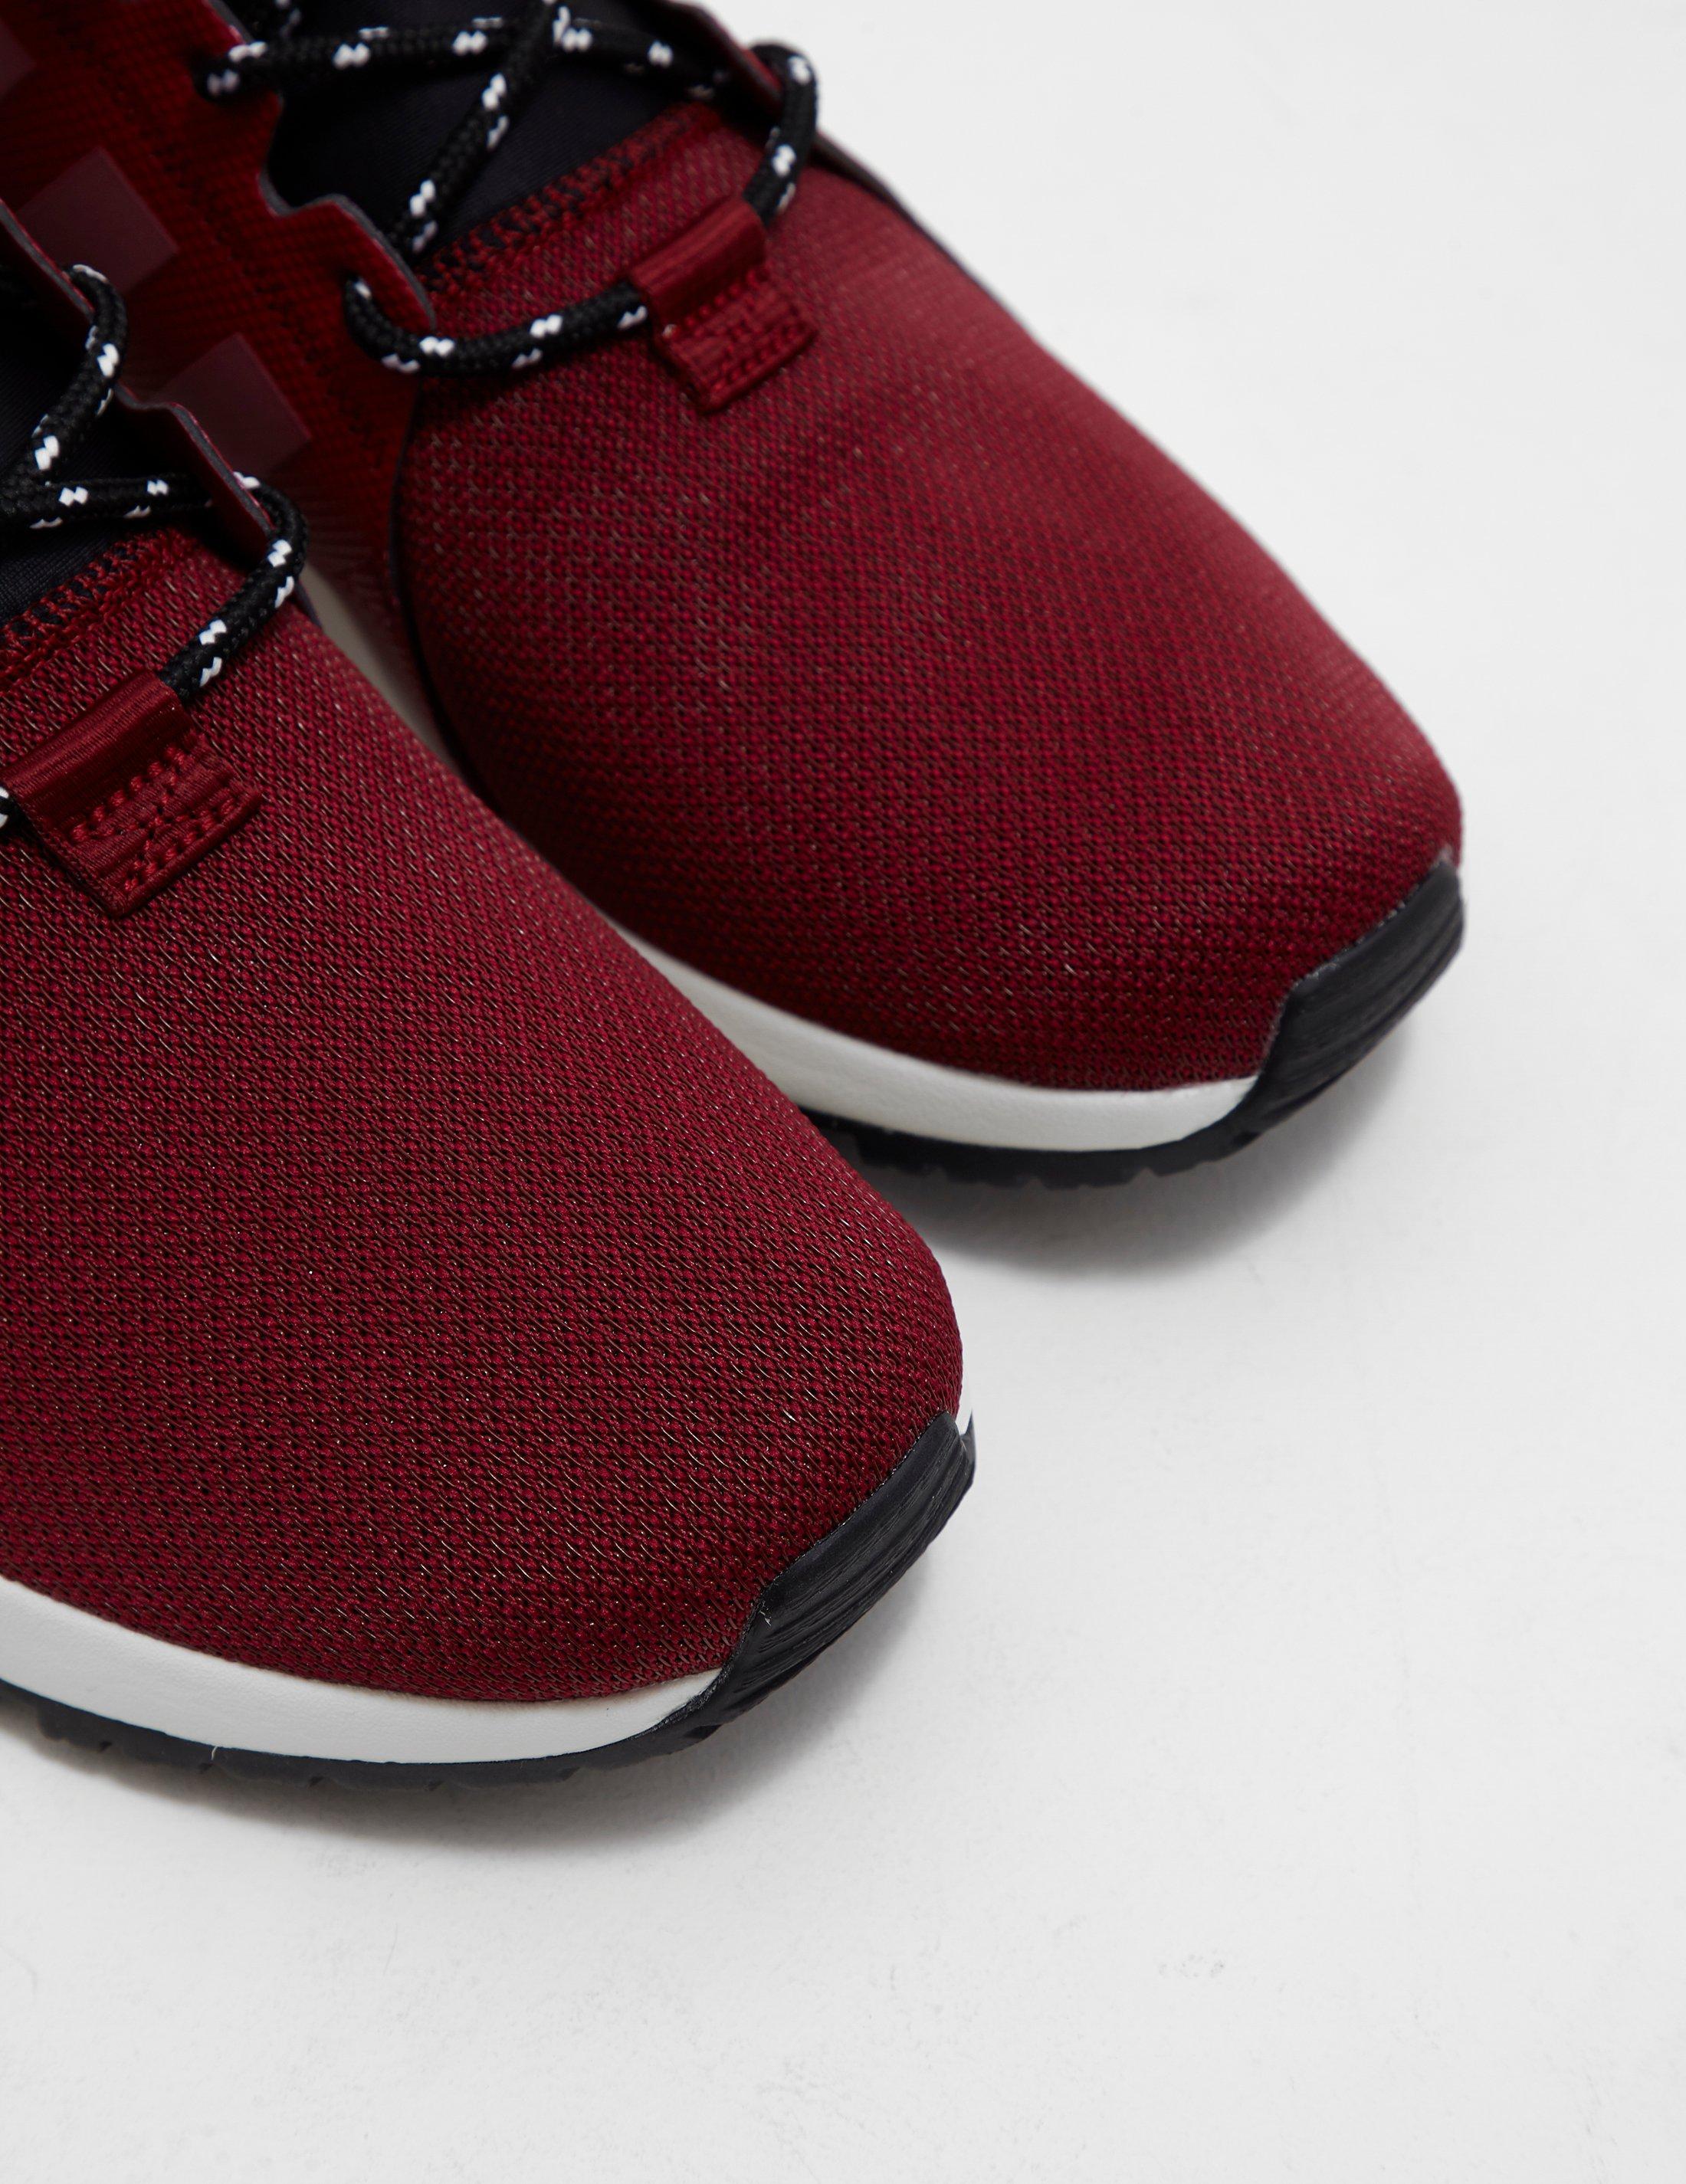 eba44043d57 adidas Originals Mens Xplr Sneakerboot Burgundy burgundy for Men - Lyst